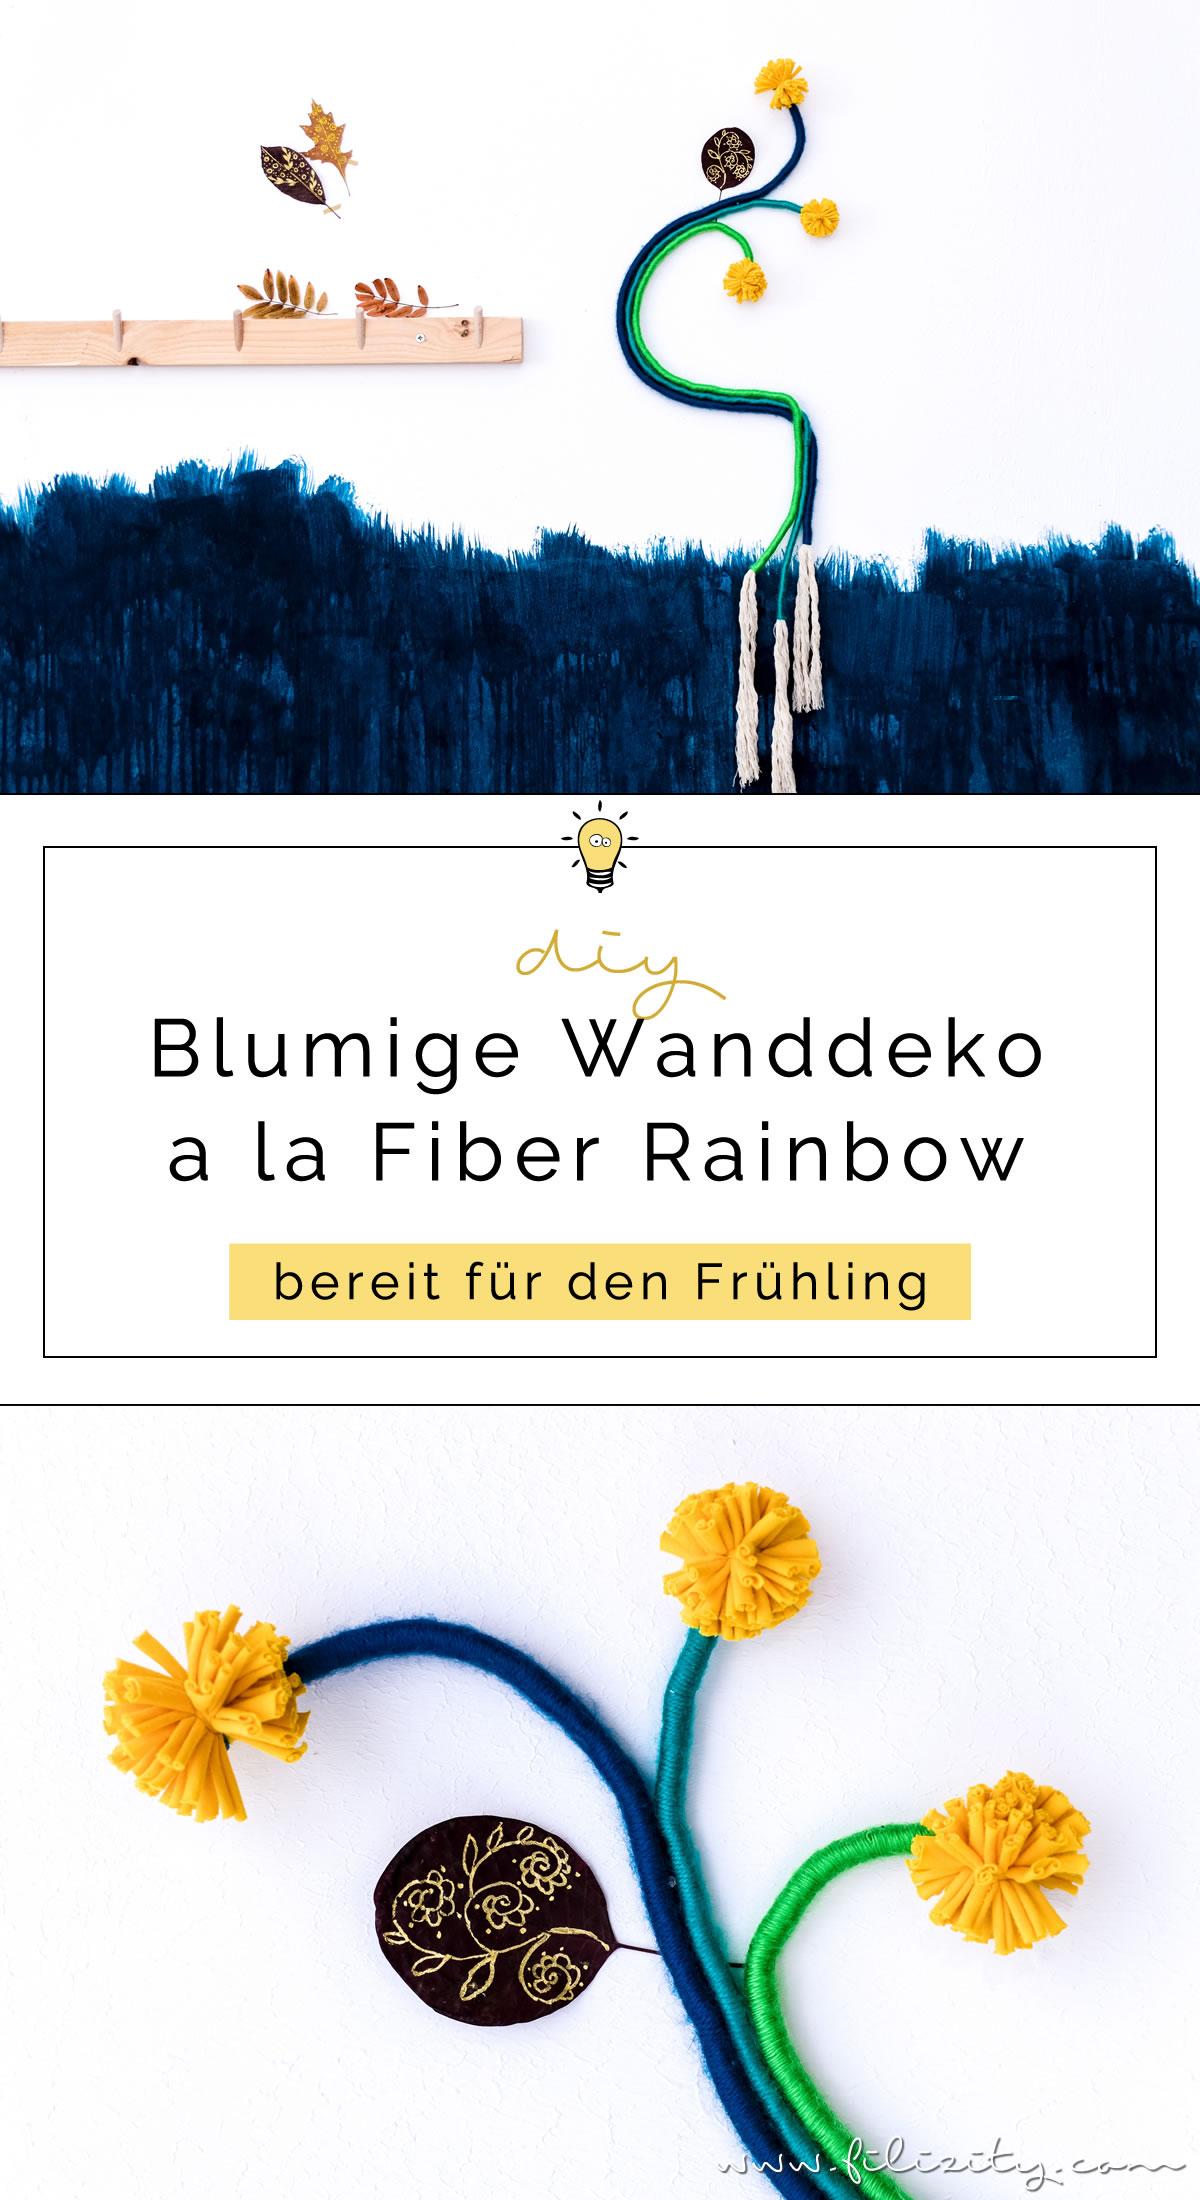 DIY Wanddeko im Fiber Rainbow Stil selber machen | Filizity.com | DIY-Blog aus dem Rheinland #fiberrainbow #rainbow #regenbogen #wolle #frühling